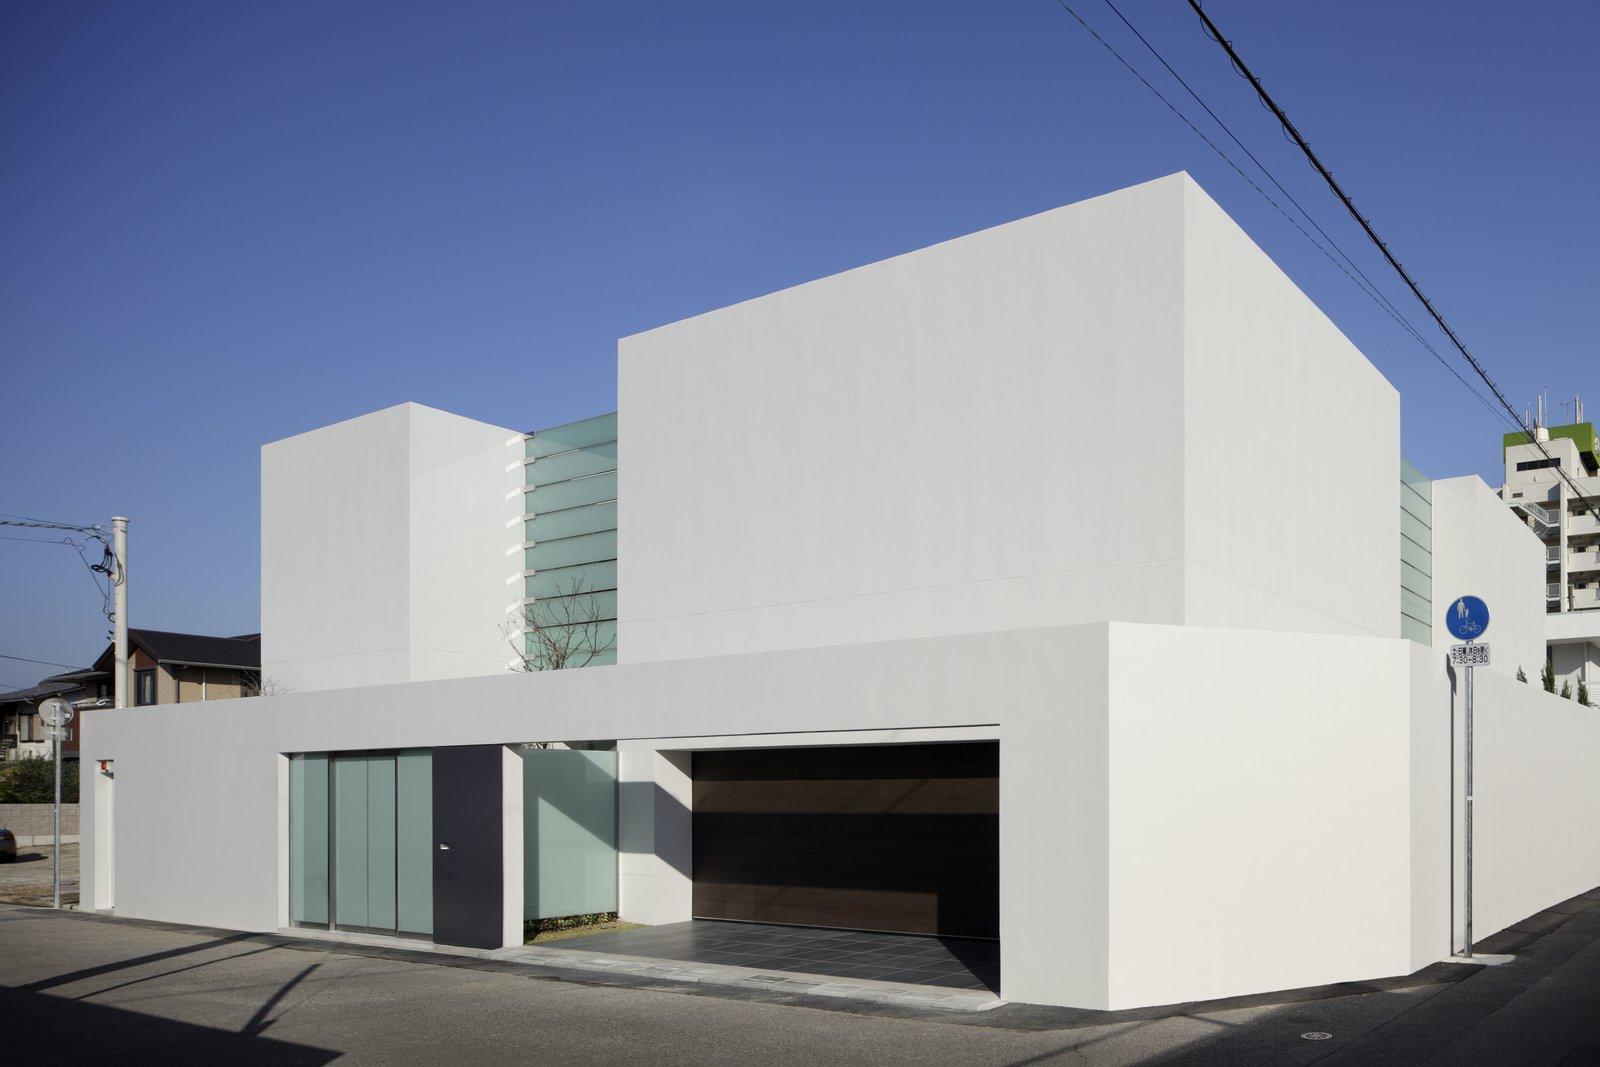 Harmonia by Yas. Maeda/M-architects